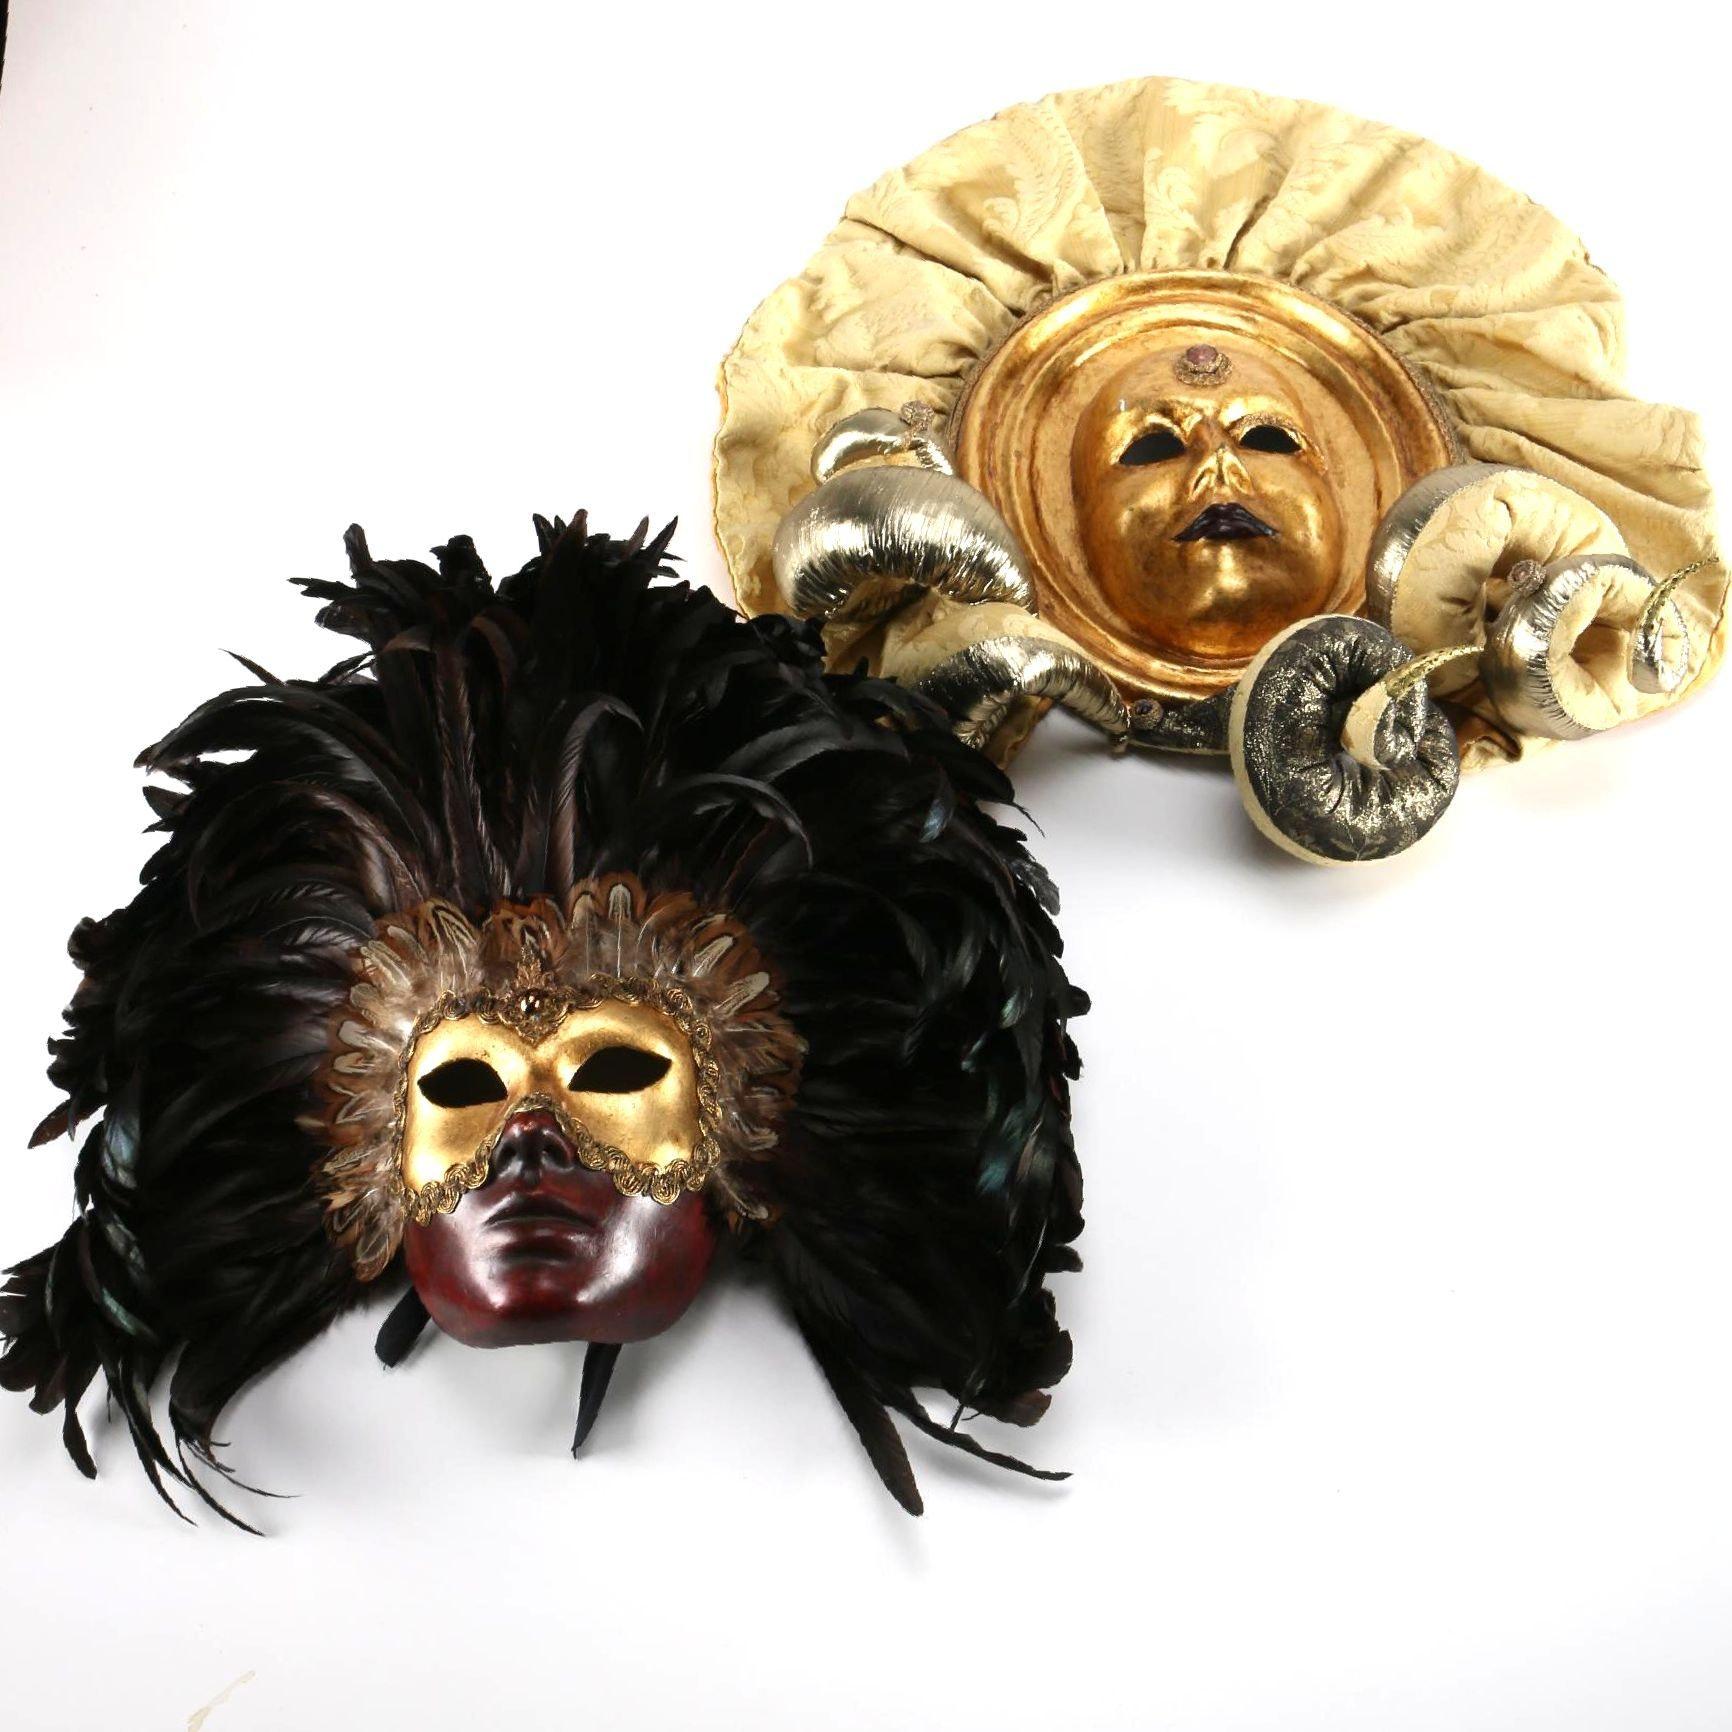 Pair of Elaborate Masks